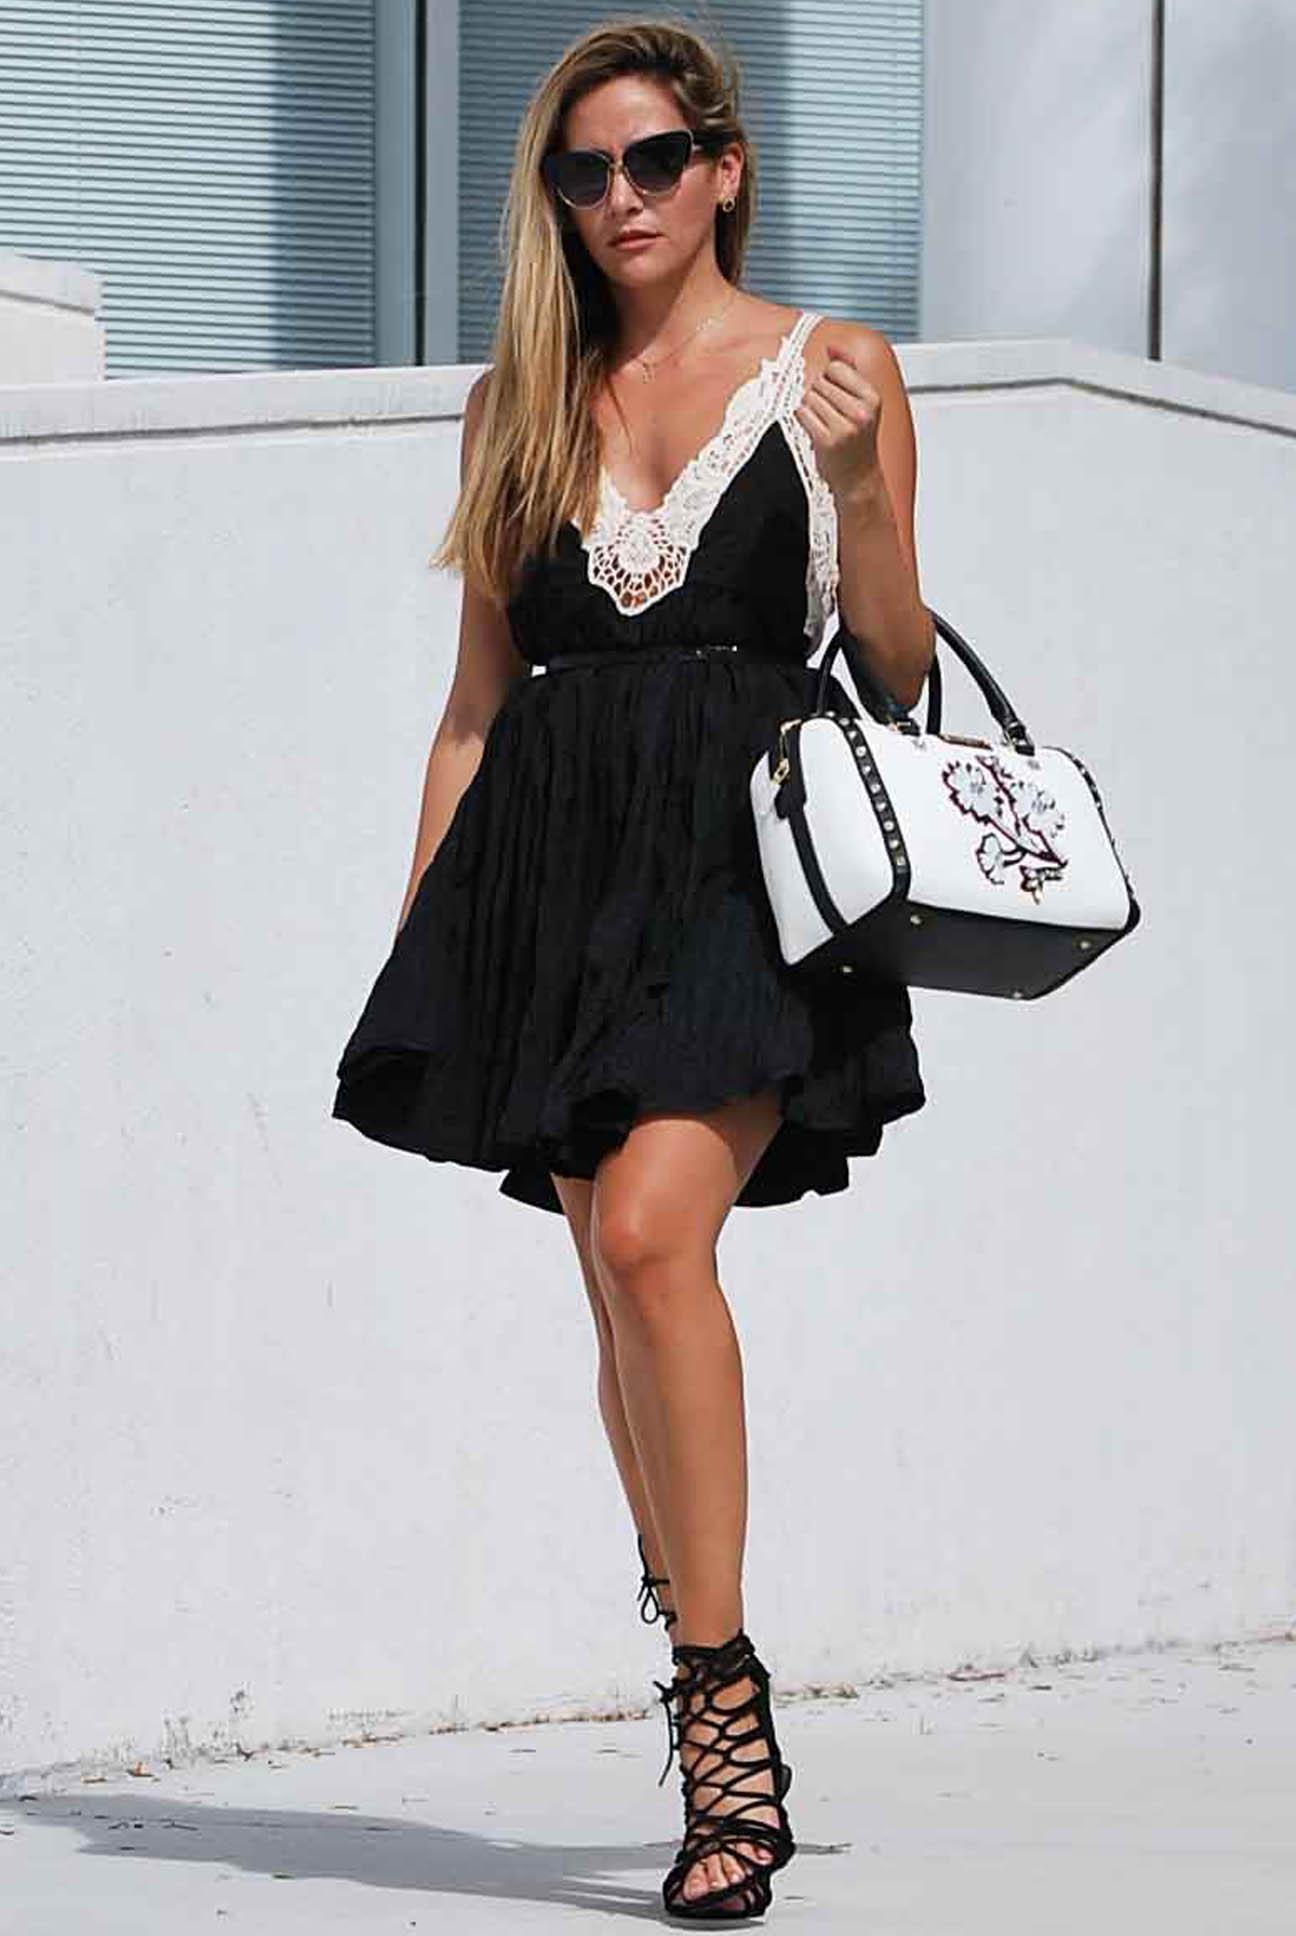 Long Wedding Dress, Prom Dress, Lace Dress, Chiffon Dress, Sexy Short Dress, Maxi Dress, Maxi Open Back Dress, Open Back Dress, Halter Dress, Summer Dress, Beach Dress, Resort Dress, Evening Dress, Black Gown, Printed Chiffon Dress, Digital Printed Dress, Strappy Dress, Asymmetric Dress, Long Sleeve Dress, Long Boho Dress, Boho Dress, Flow Dress, Adjustable Dress,Bridesmaid Dress, Resort Wedding Dress, Little Black Dress, White Ruffle Dress, Ruffle Dress, Maxi Cover Up, Full Length Cover Up,Halter Spaghetti Straps Dress, Mermaid Dress, Formal Dress, Ruffle Top, Scoop Neck, Sale, Sexy Prom Dress, Cocktail Dress, Party Dress, Sexy Dress, Backless Dress, Women Dress, Long Dress, Slit Dress, couture dress, couture gown, sexy gown, gold dress